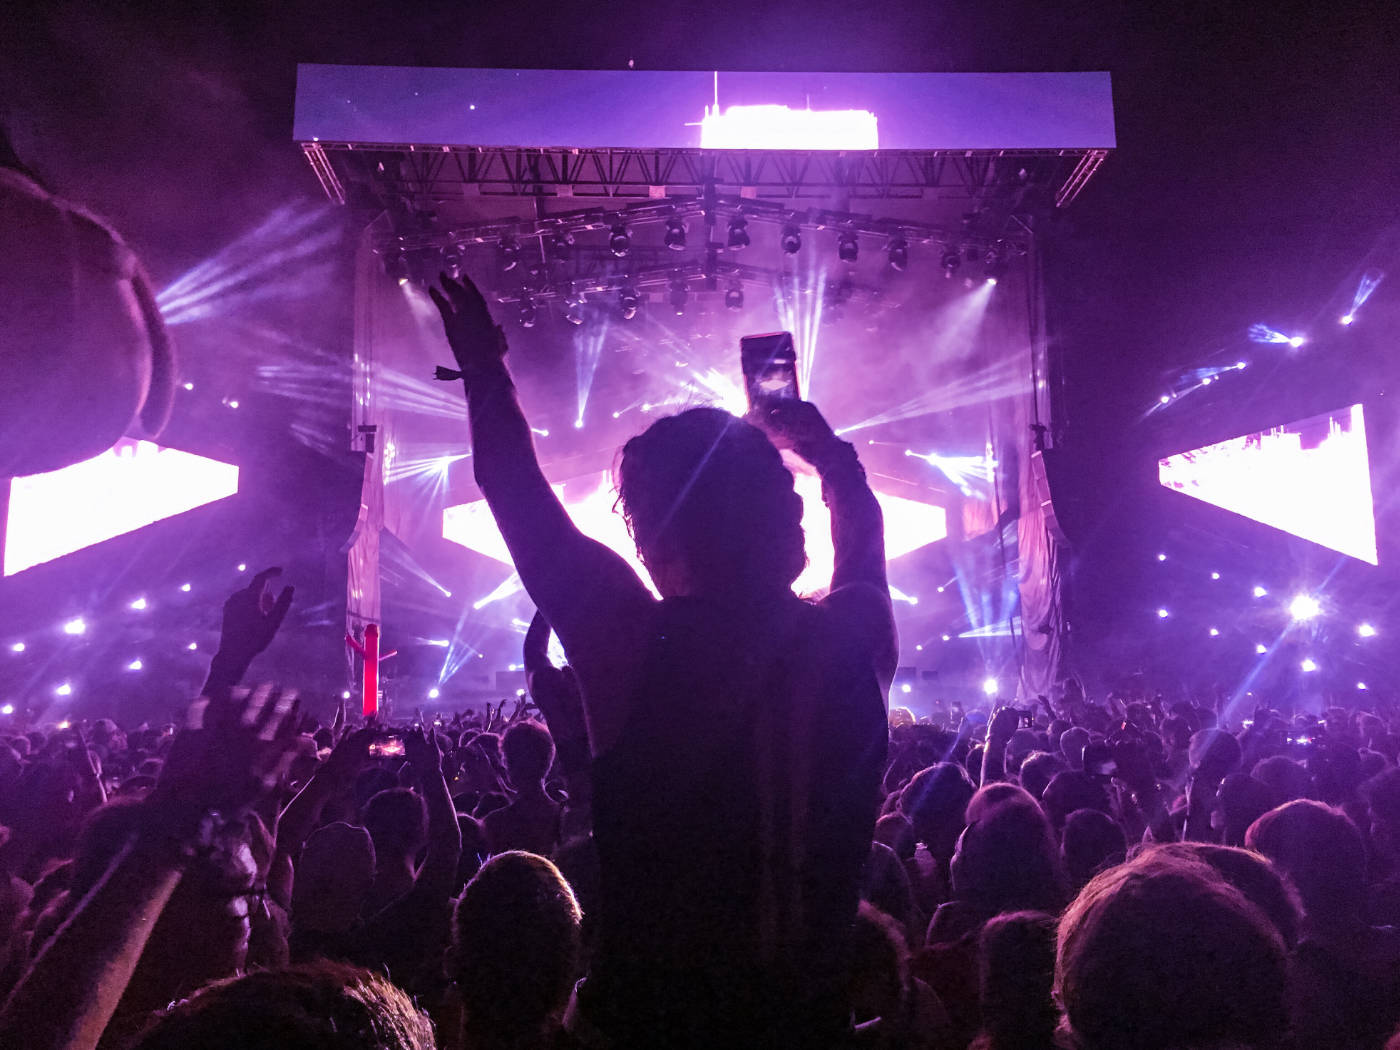 Led scherm op je festival!